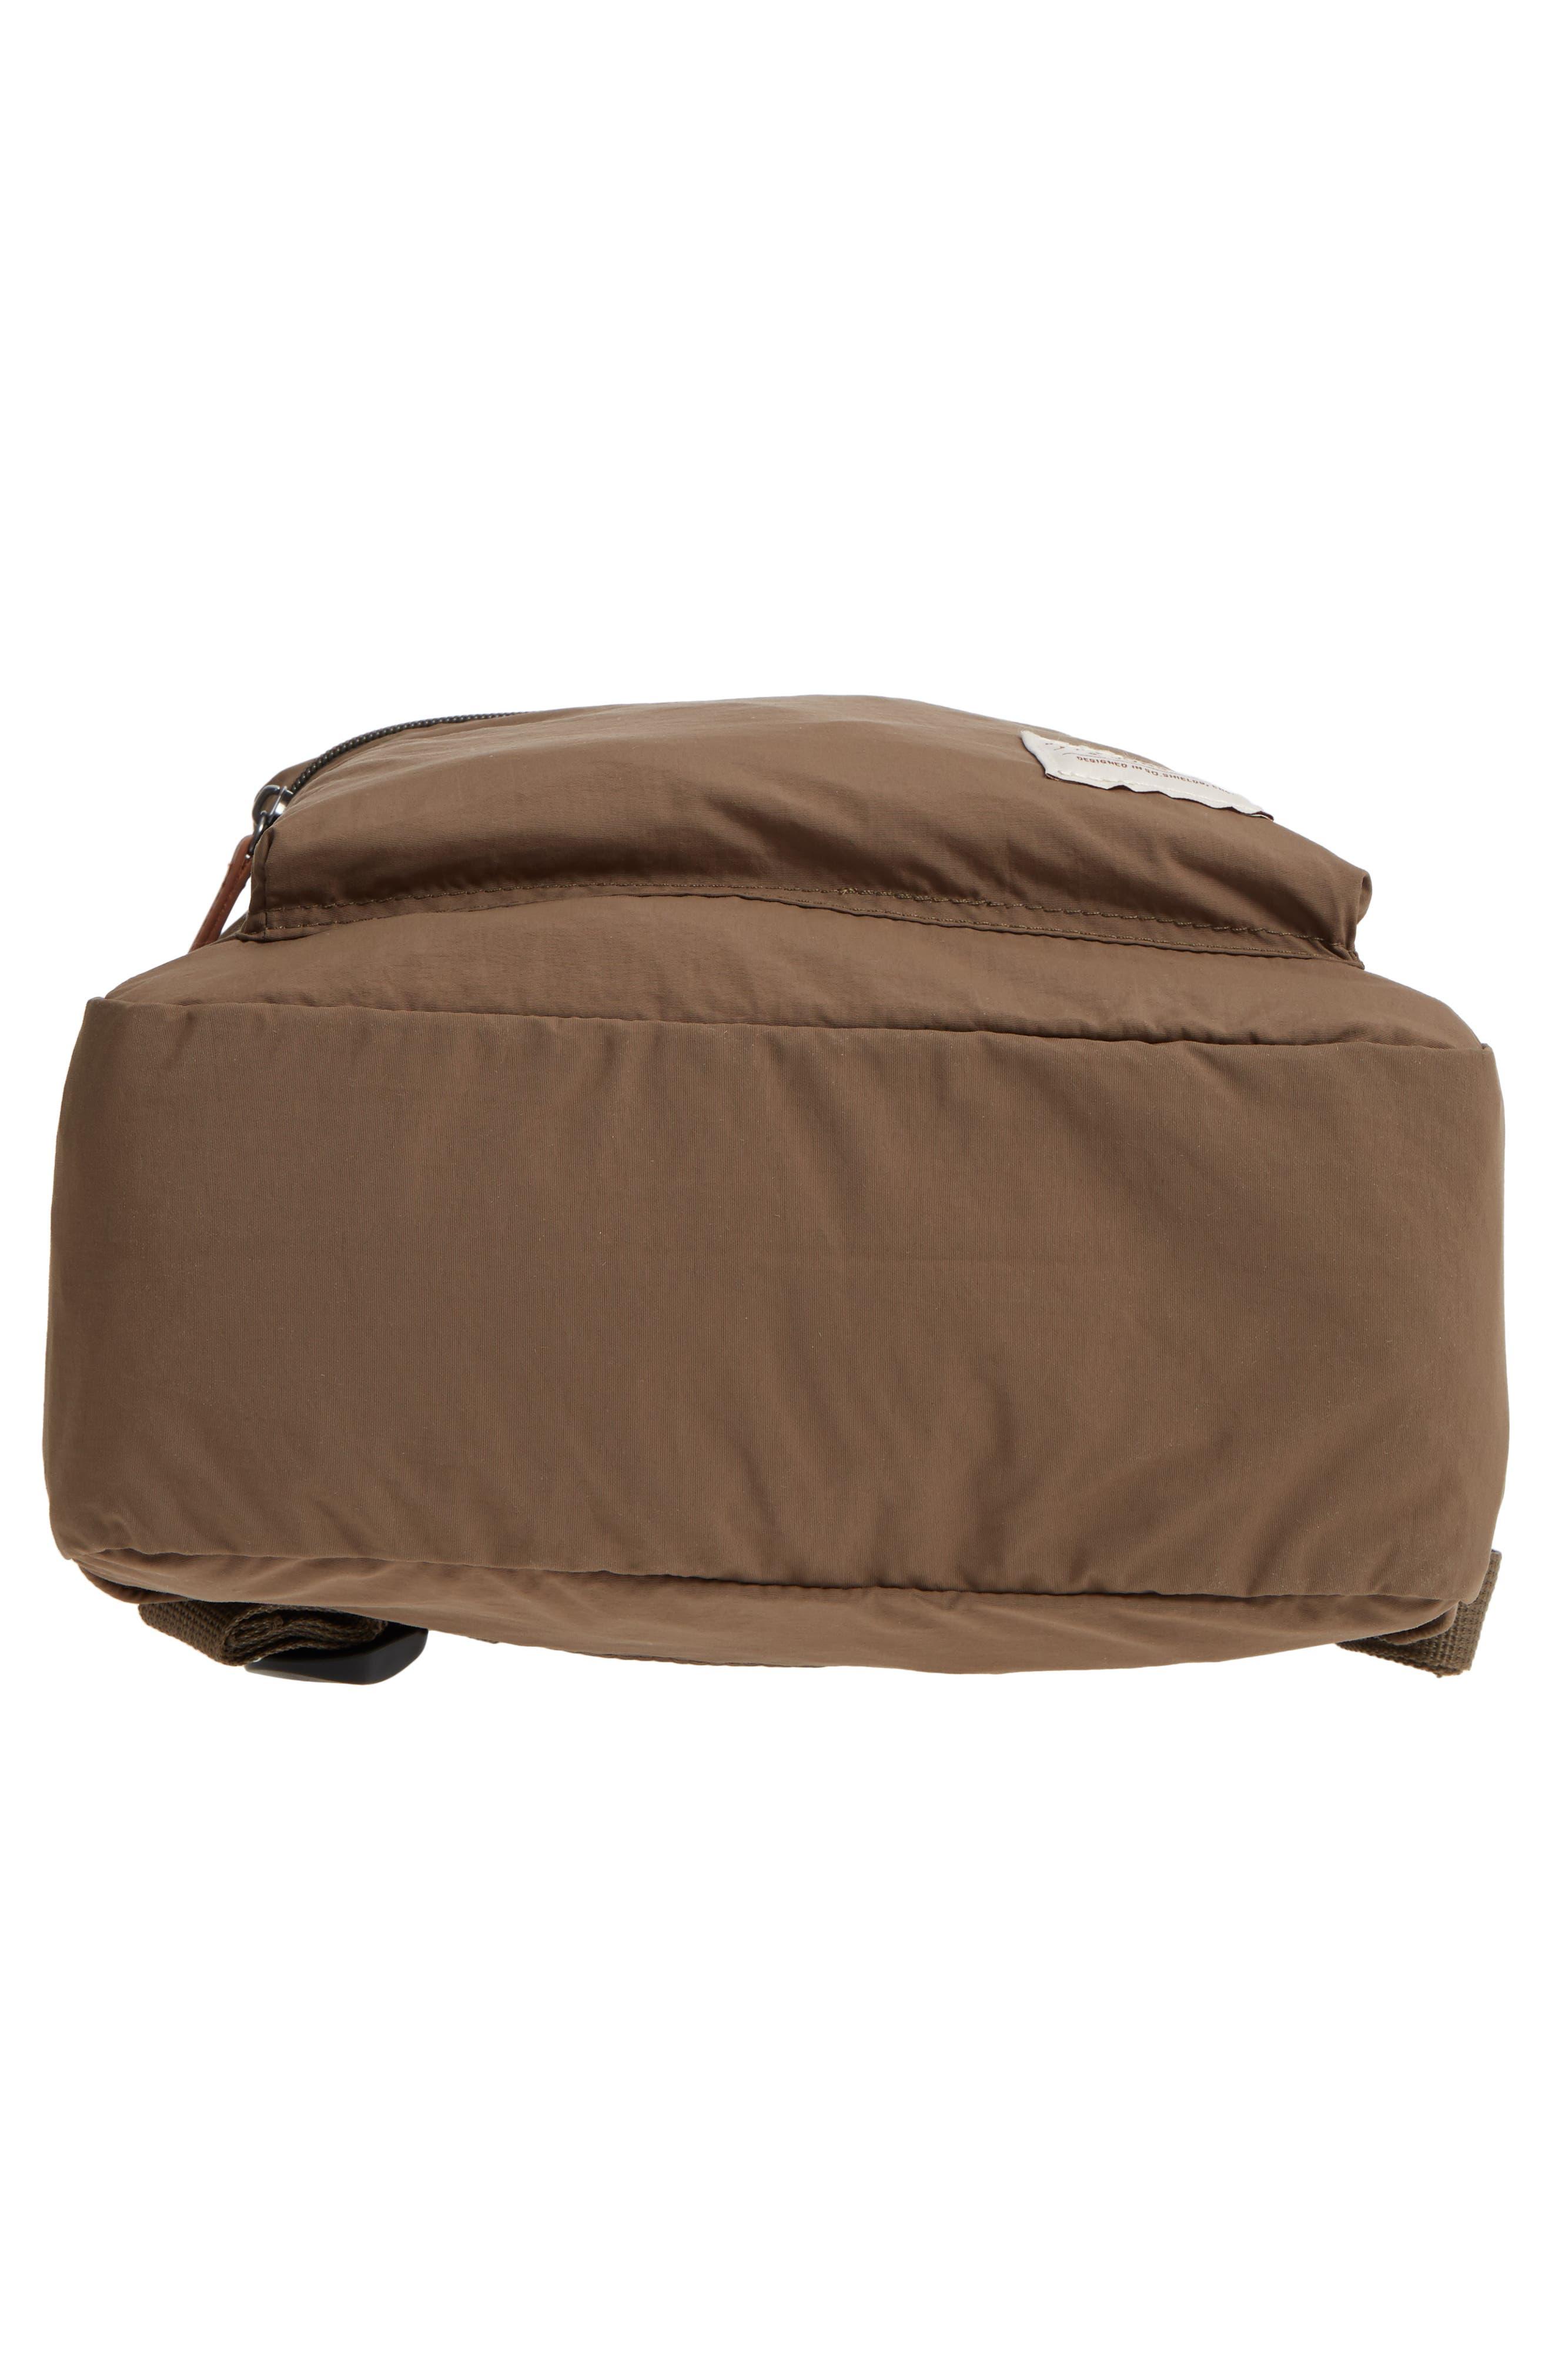 Beauly Packable Backpack,                             Alternate thumbnail 6, color,                             KHAKI